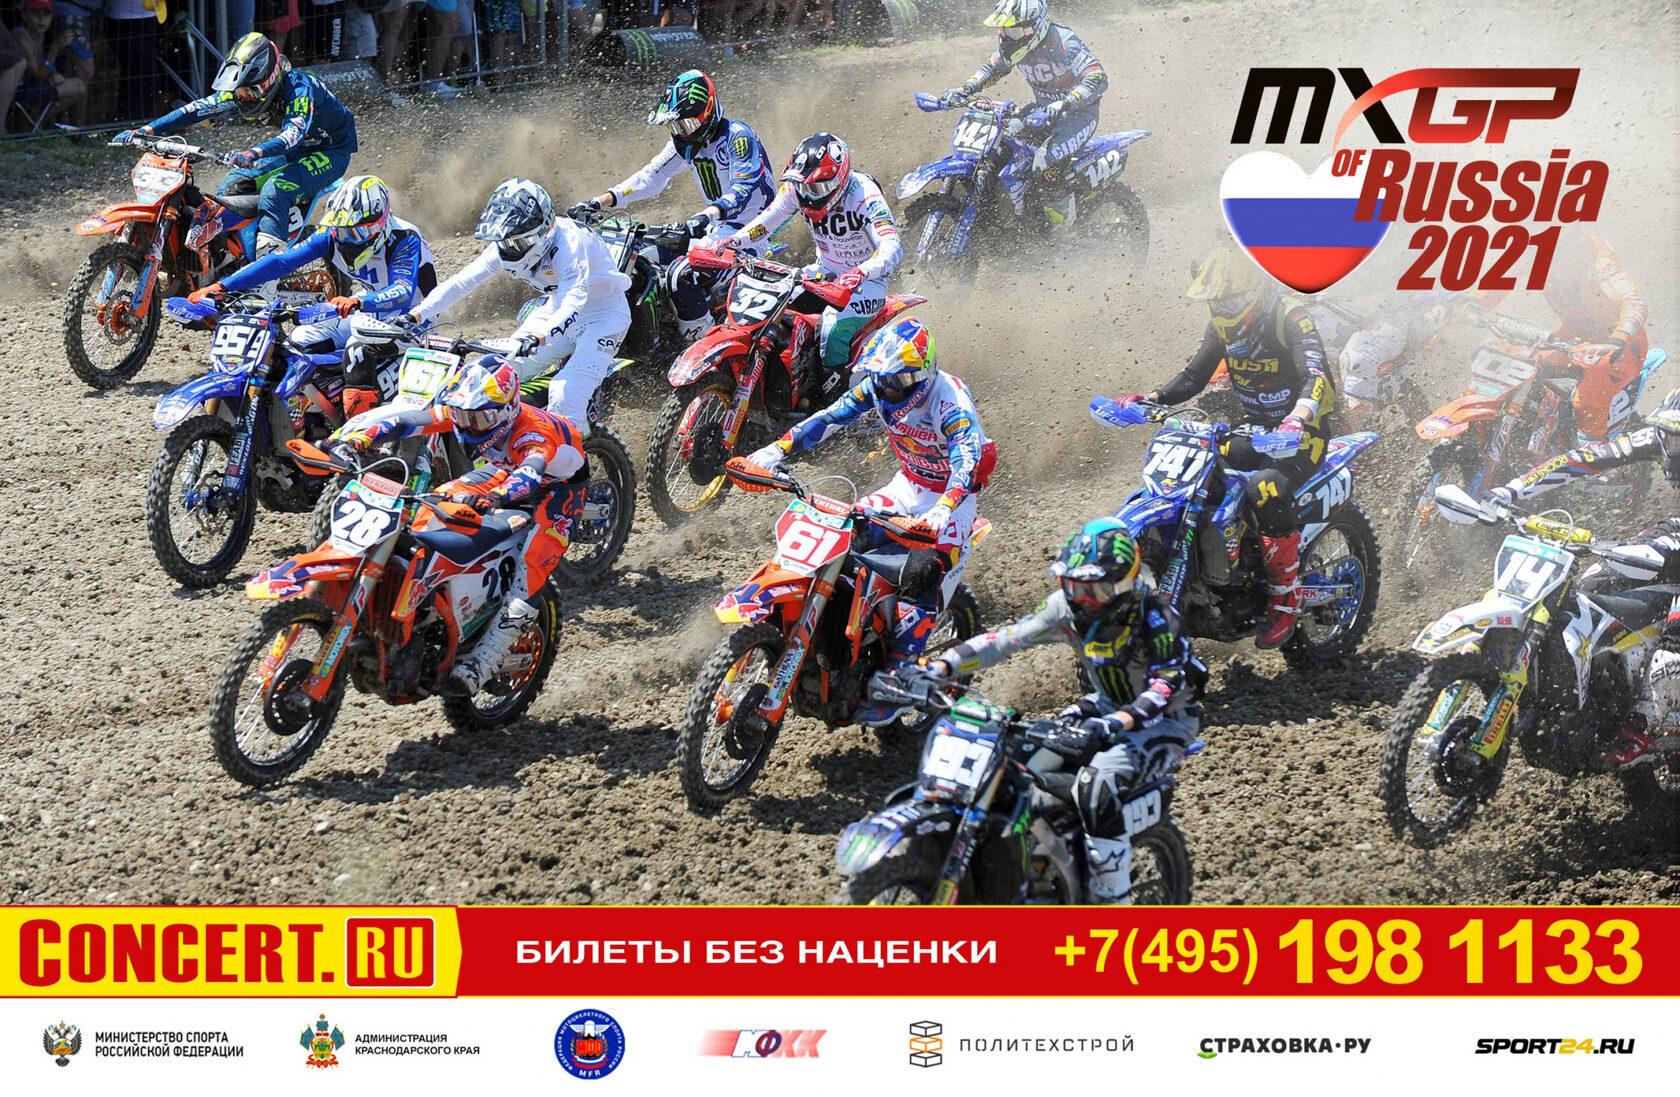 MXGP 2021: Открыта продажа билетов на Гран-при России